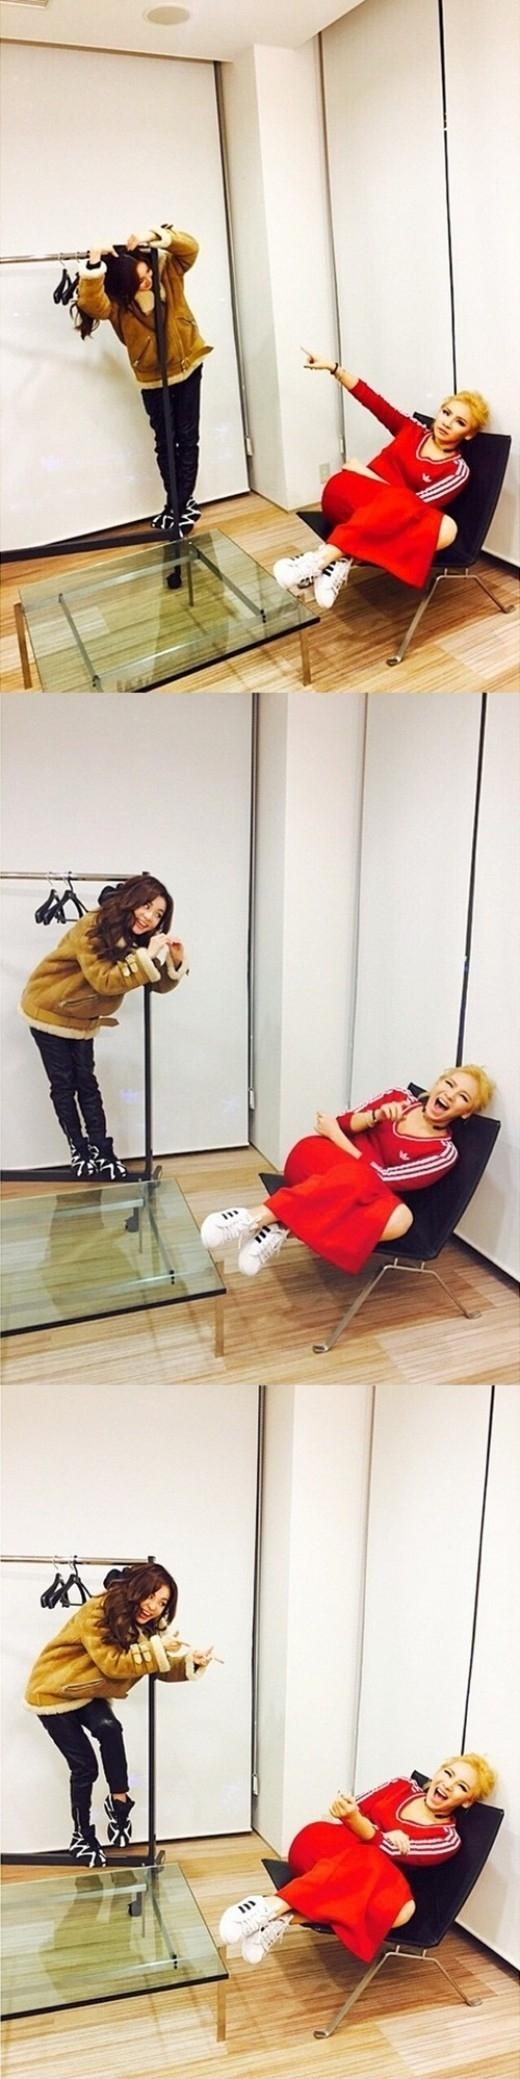 "2NE1のDARA、CLに3種の愛嬌を披露""一緒で嬉しい"""